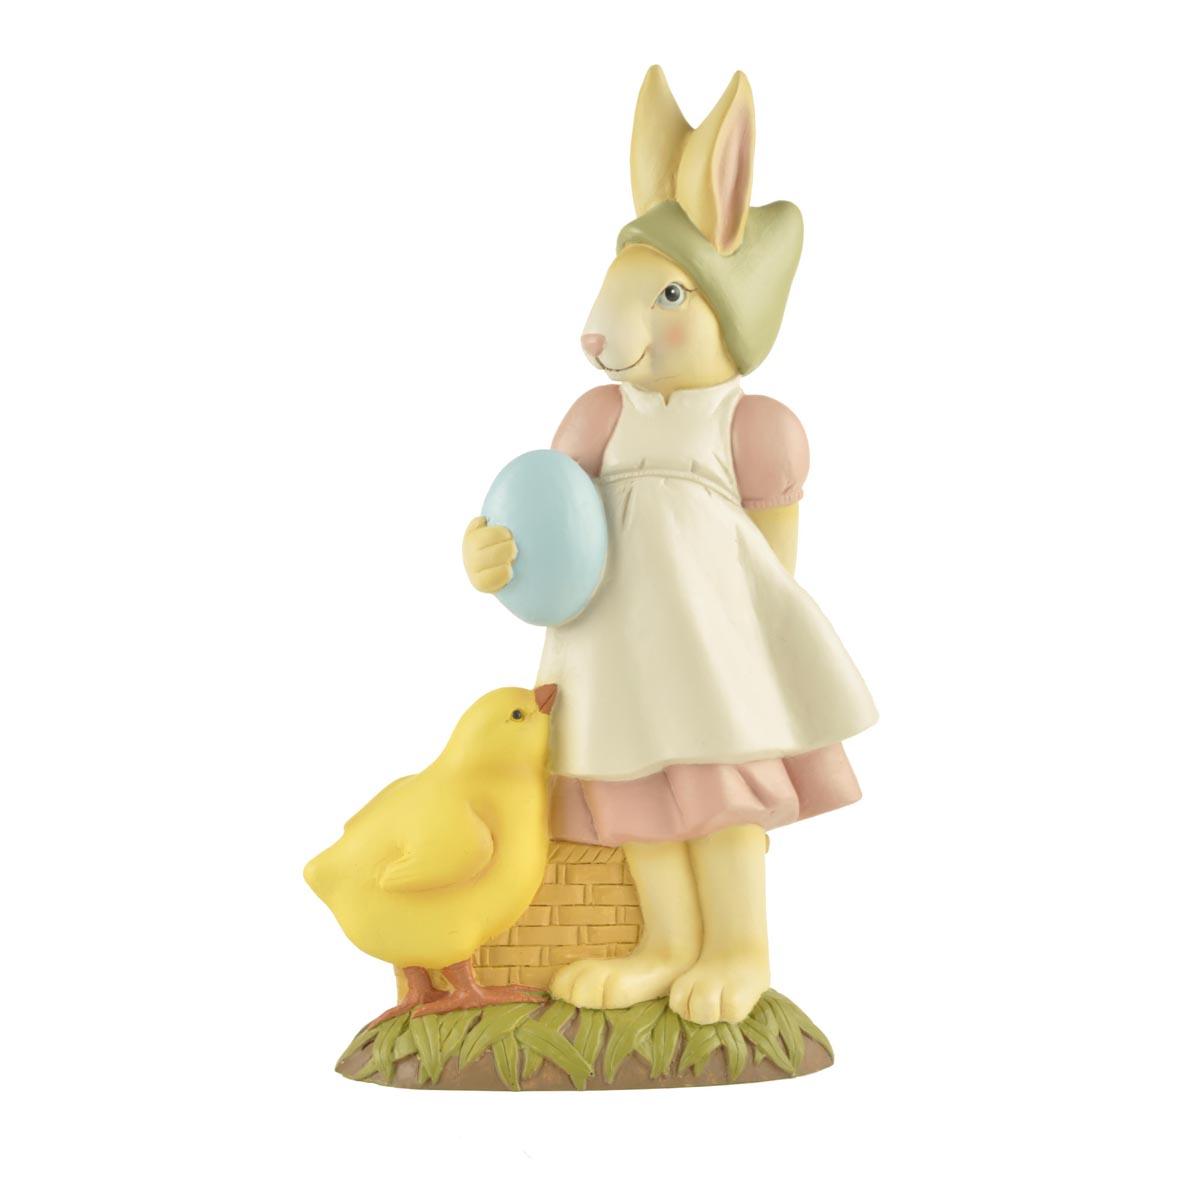 Ennas handmade animal figurine animal at discount-1